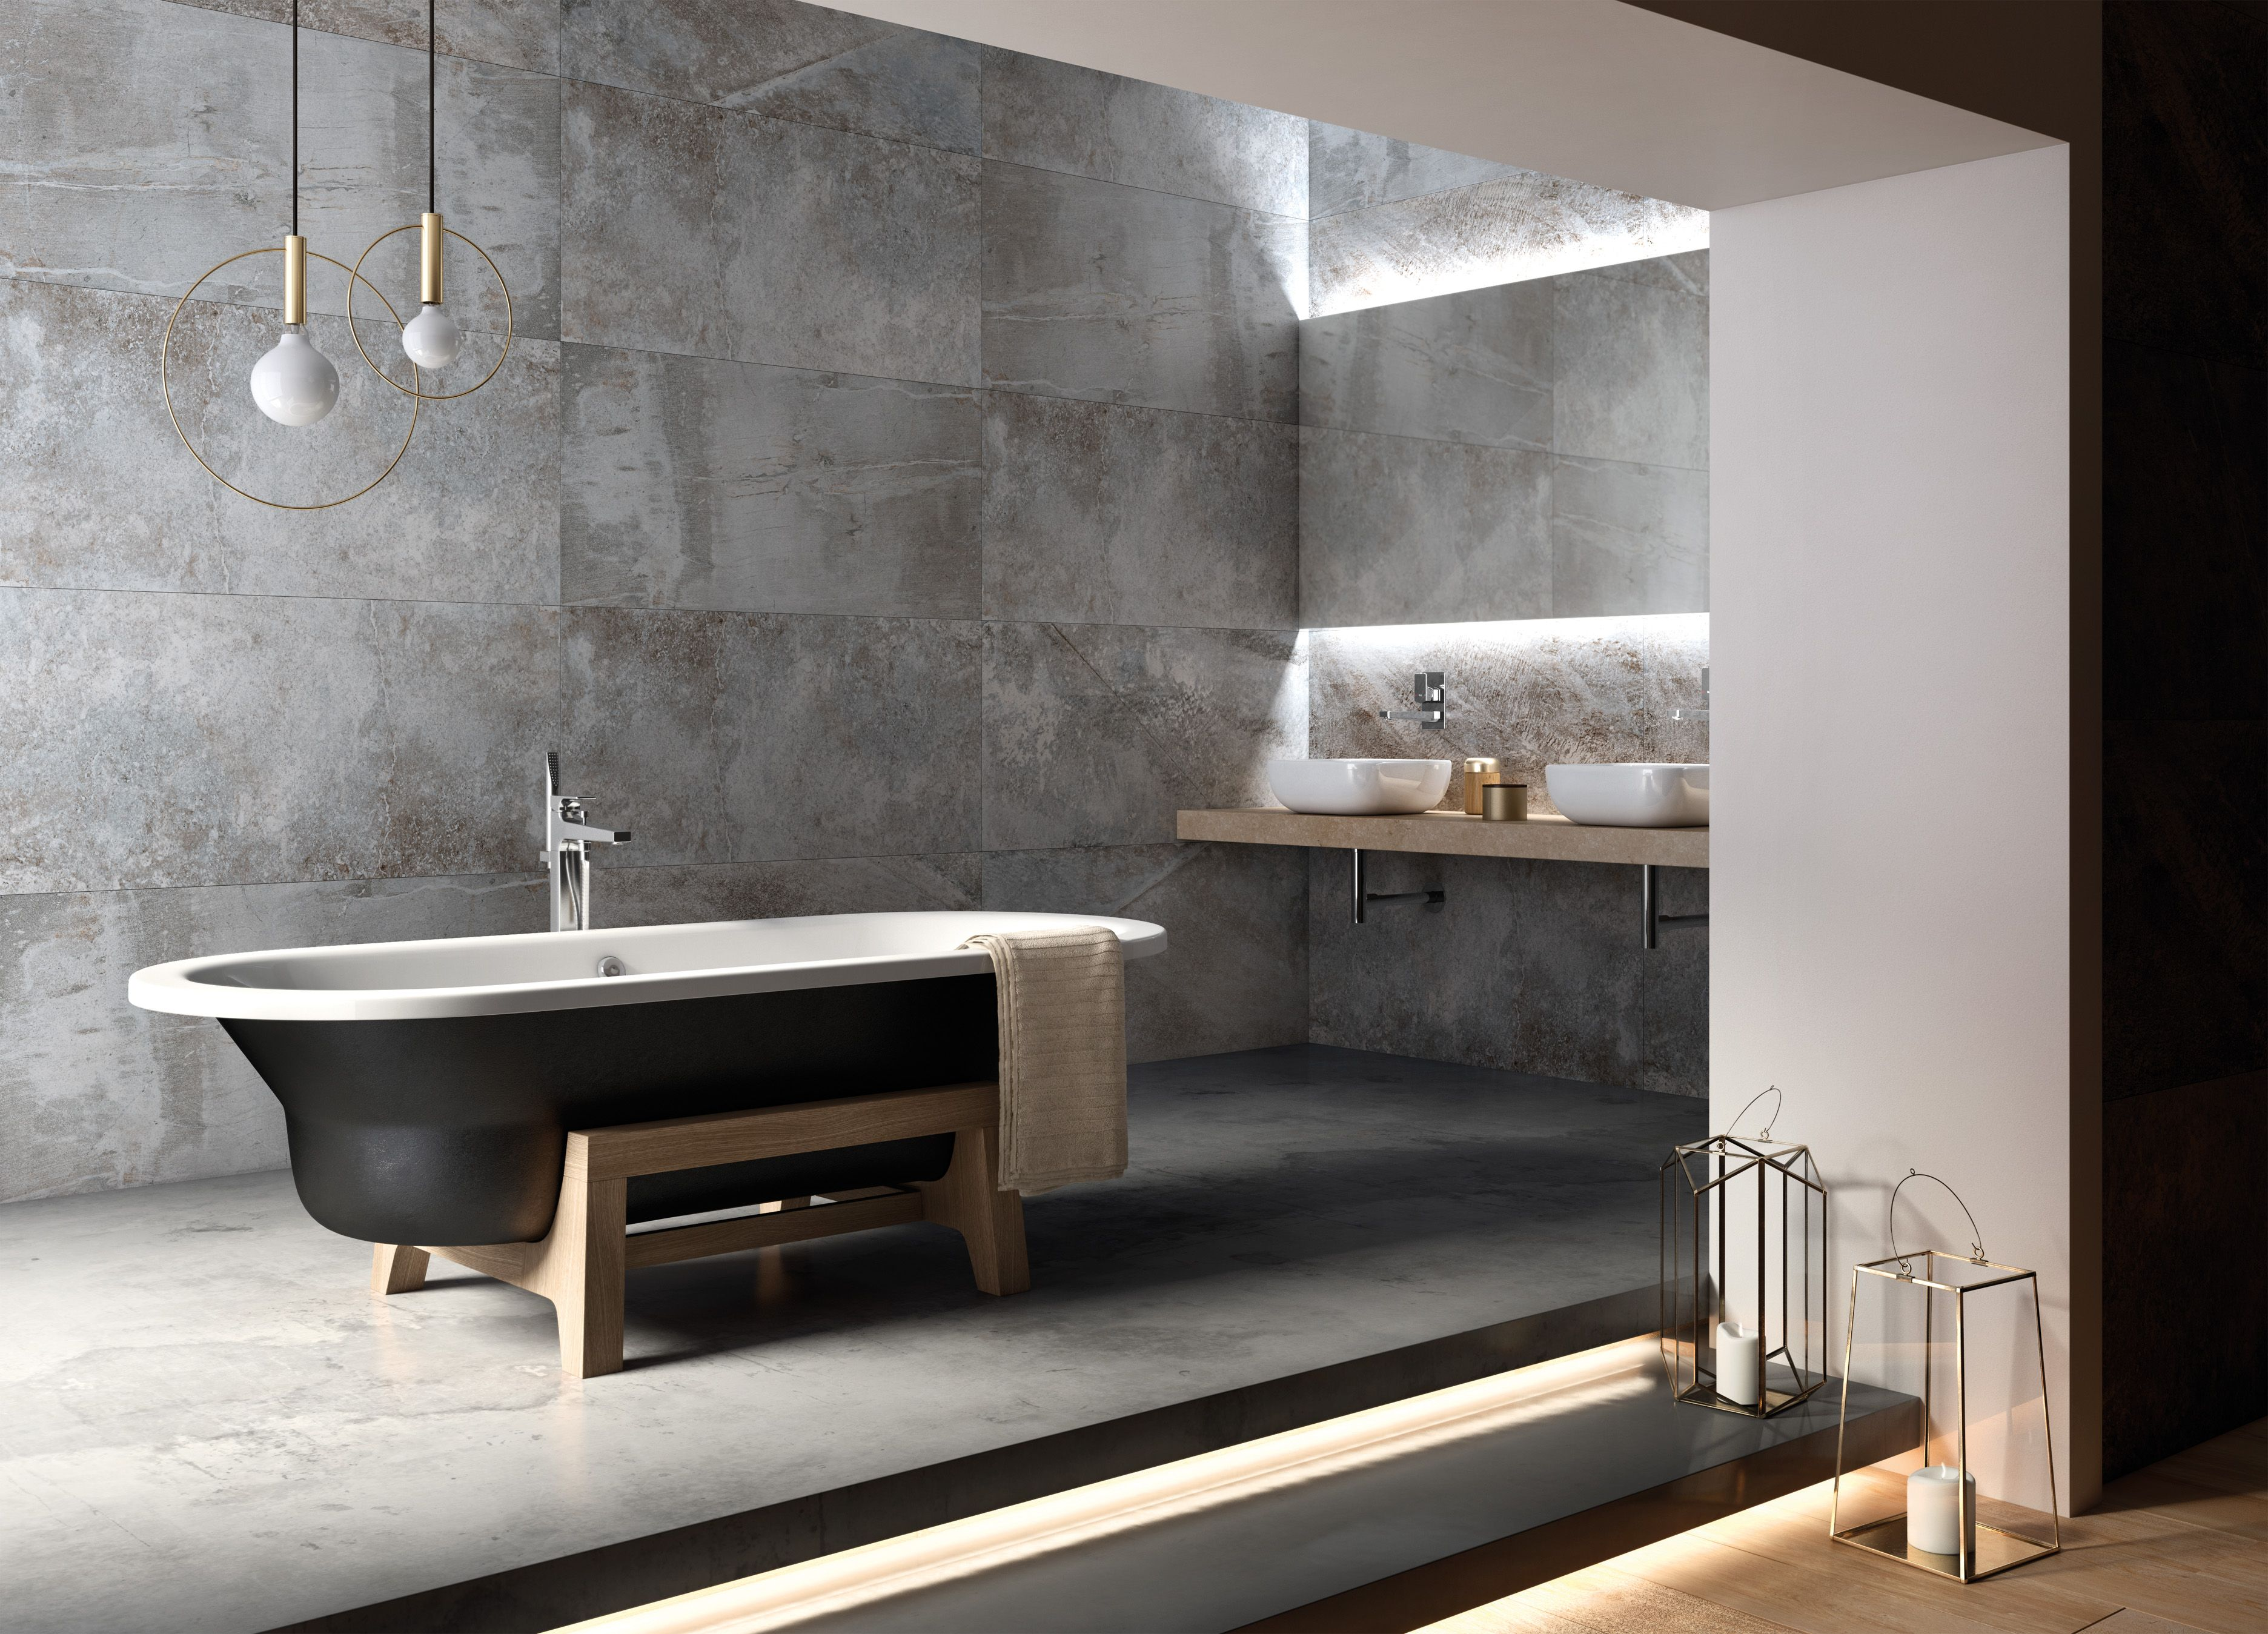 Roca Tina Art Plus Espaciomoderno Bathroomideas Homedesign  # Carmelo Muebles Luque